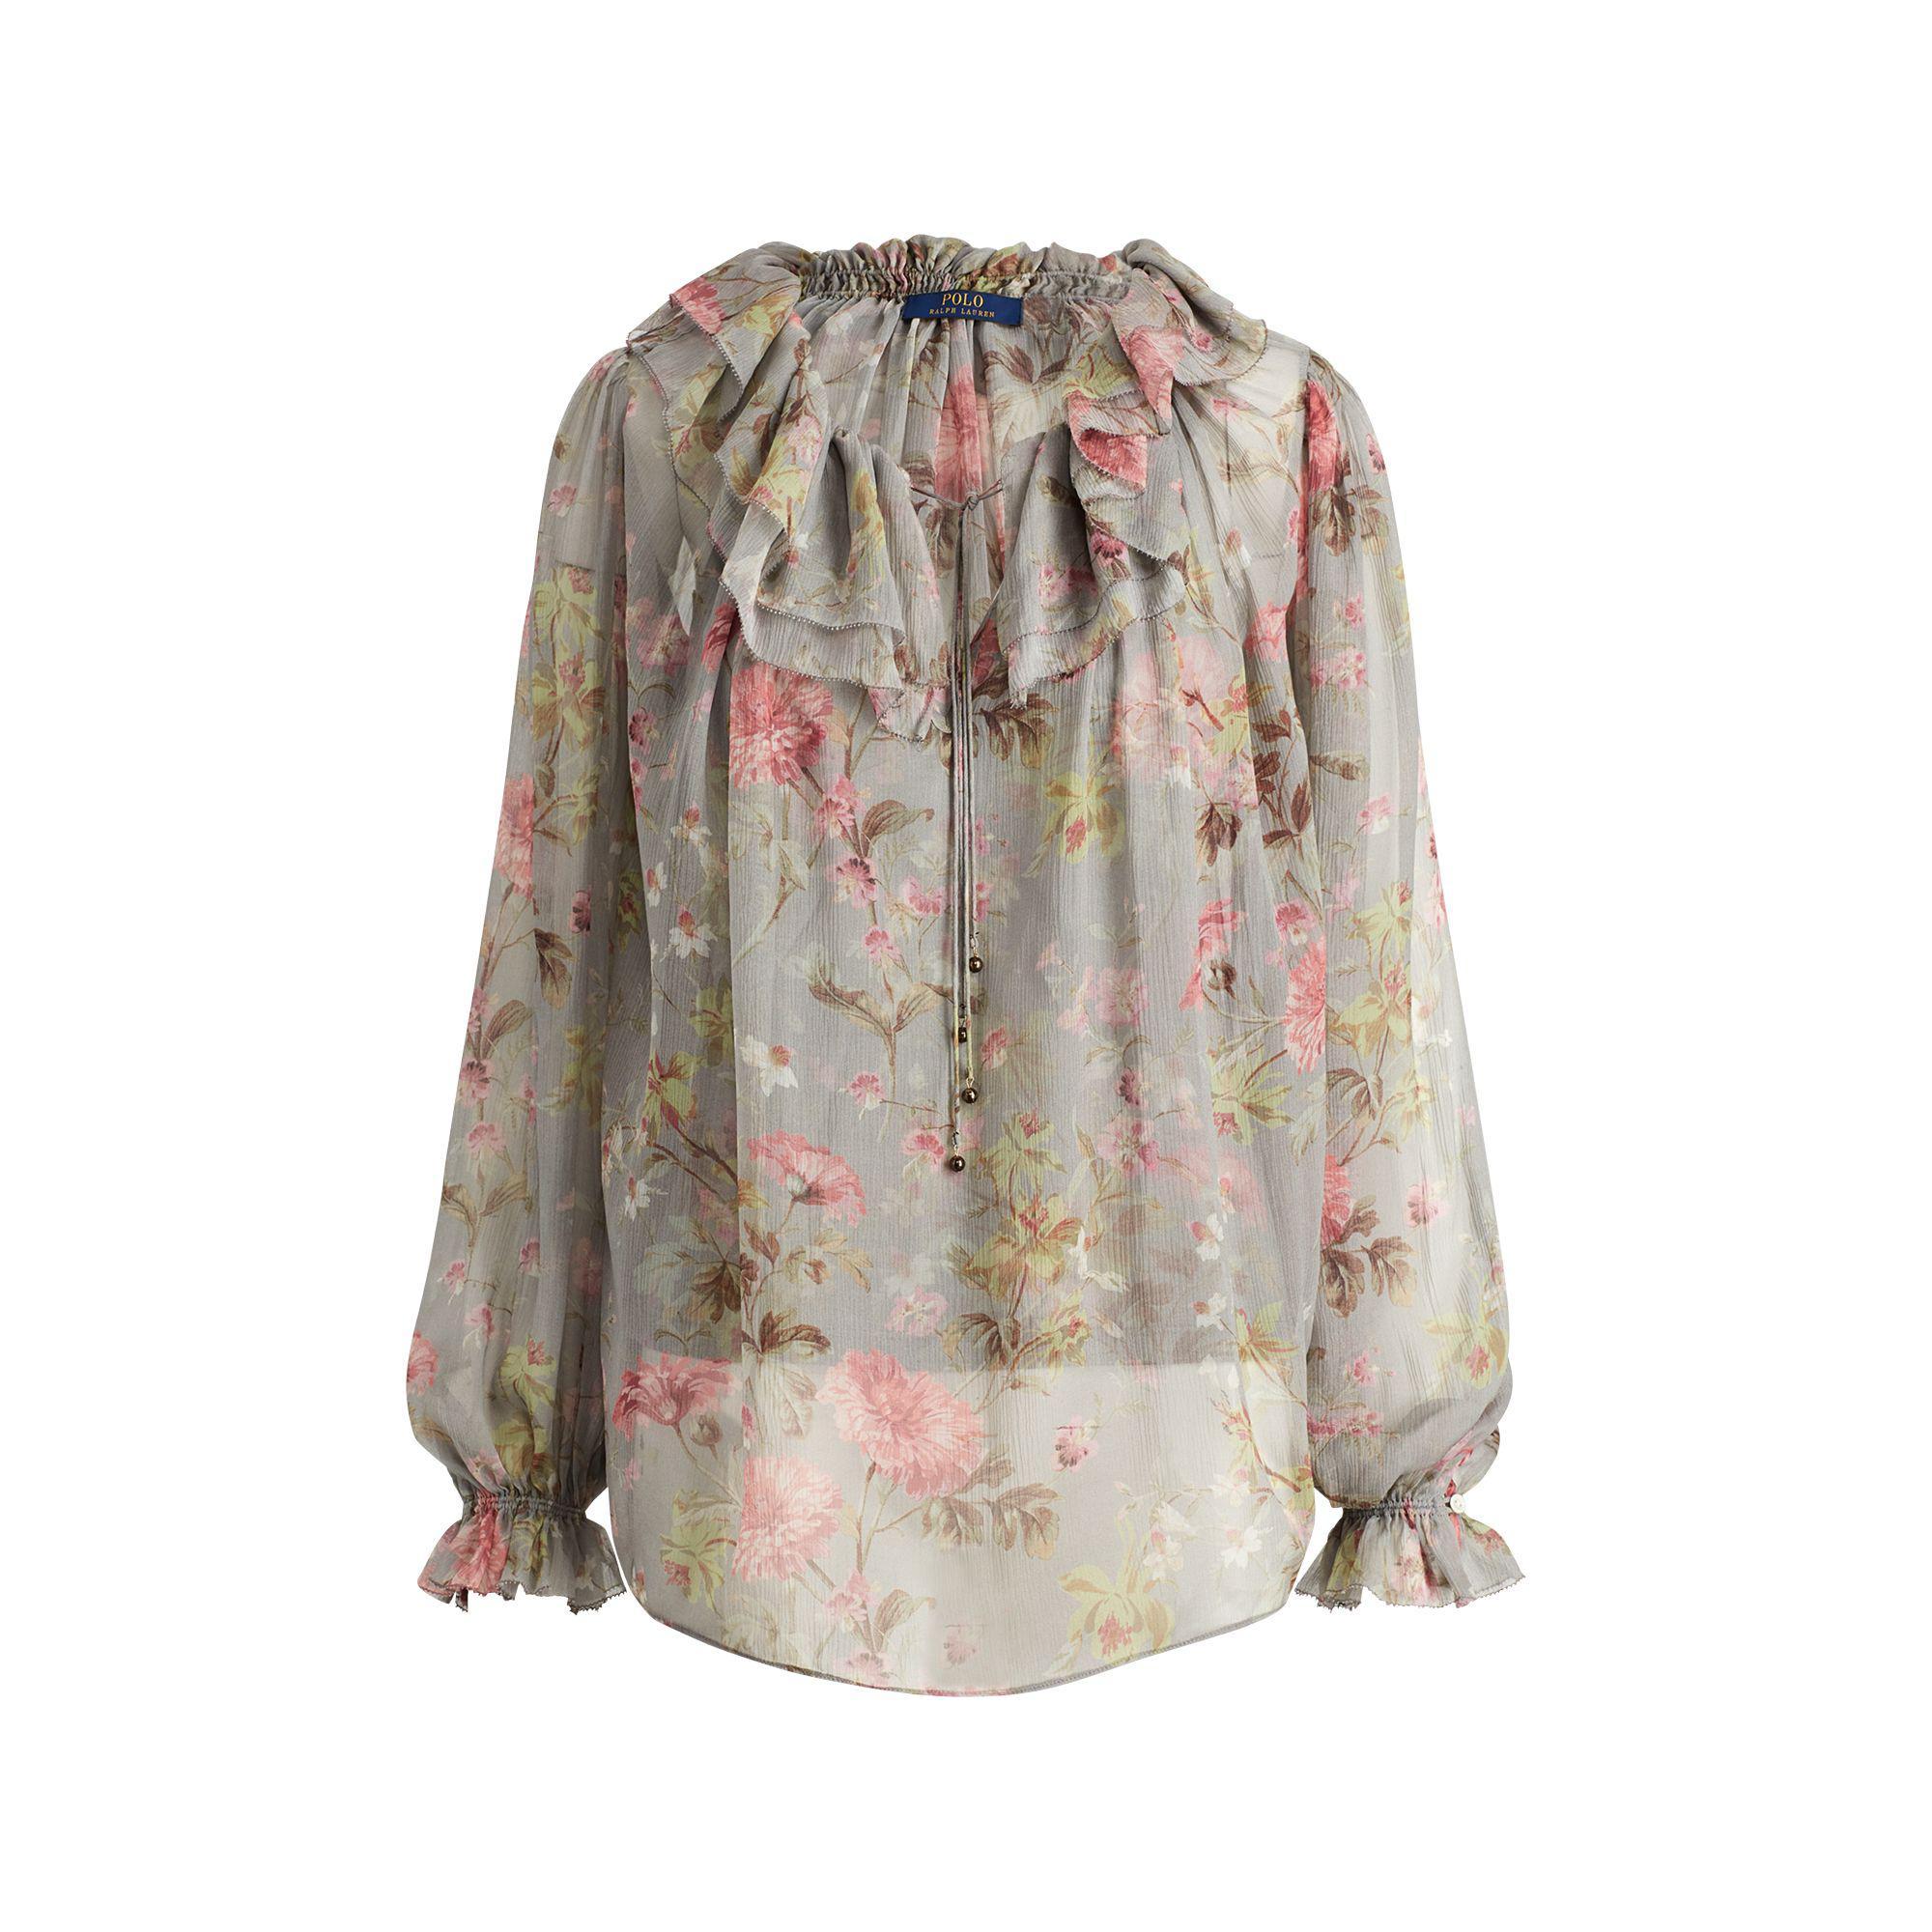 718ee0b5b Polo Ralph Lauren Sheer Silk Floral Blouse - Lyst